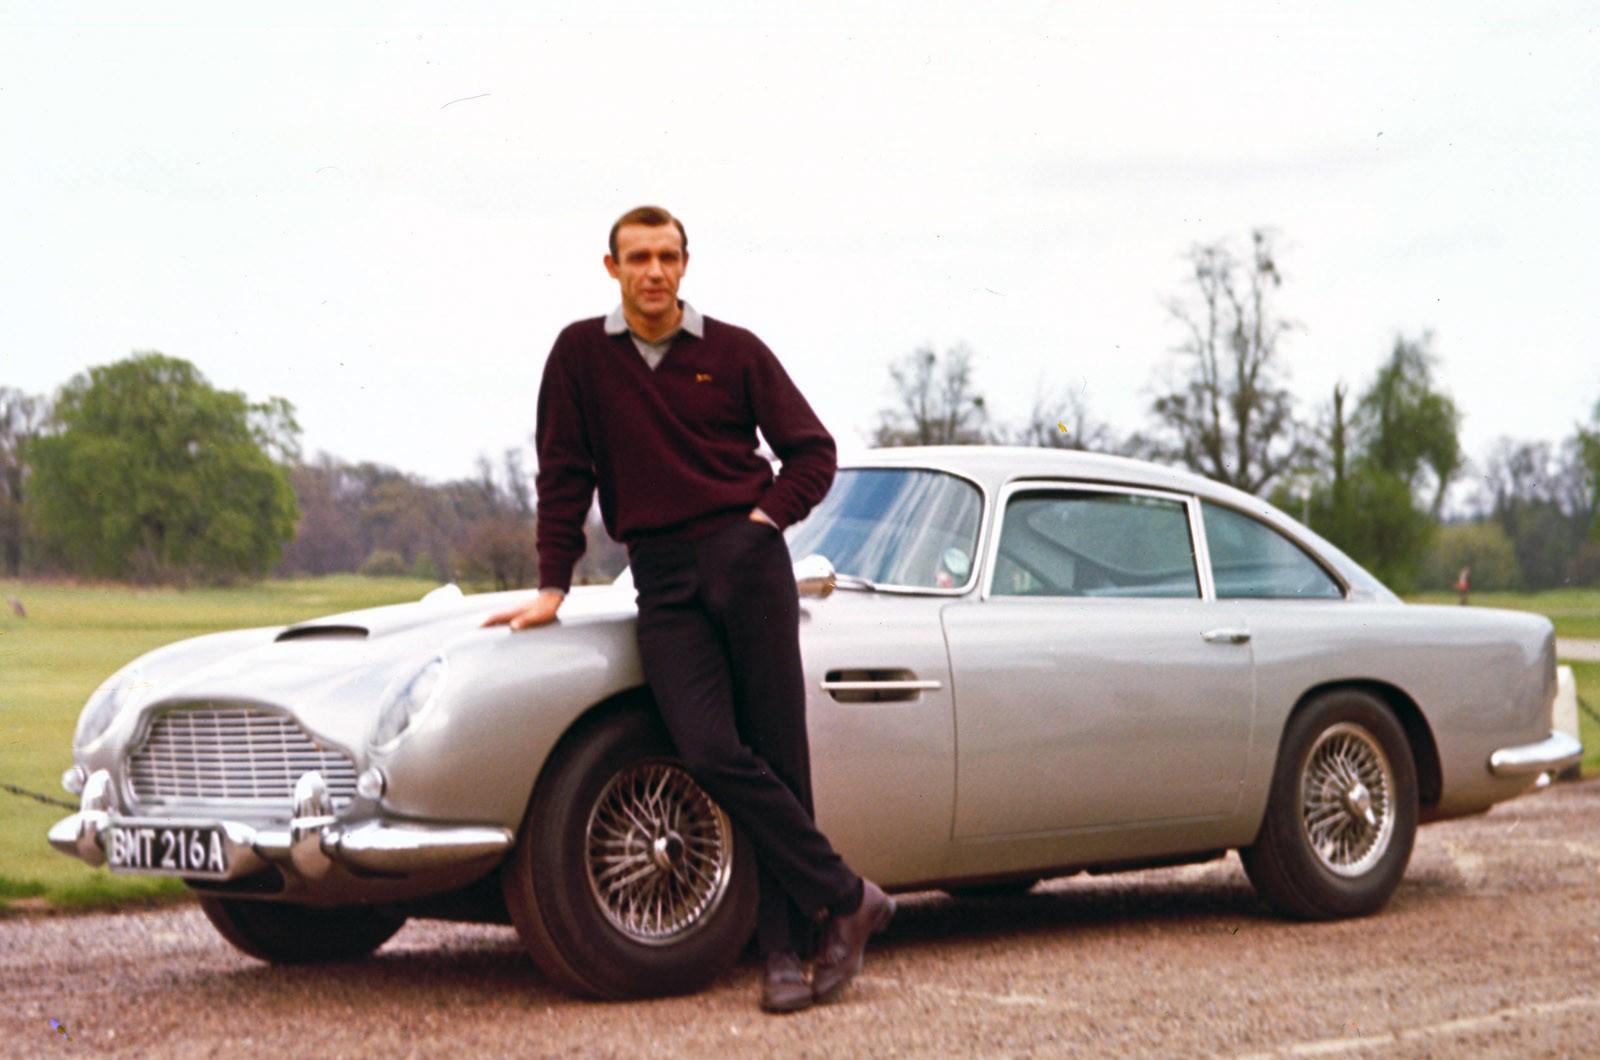 Image with Aston Martin DB5 James Bond